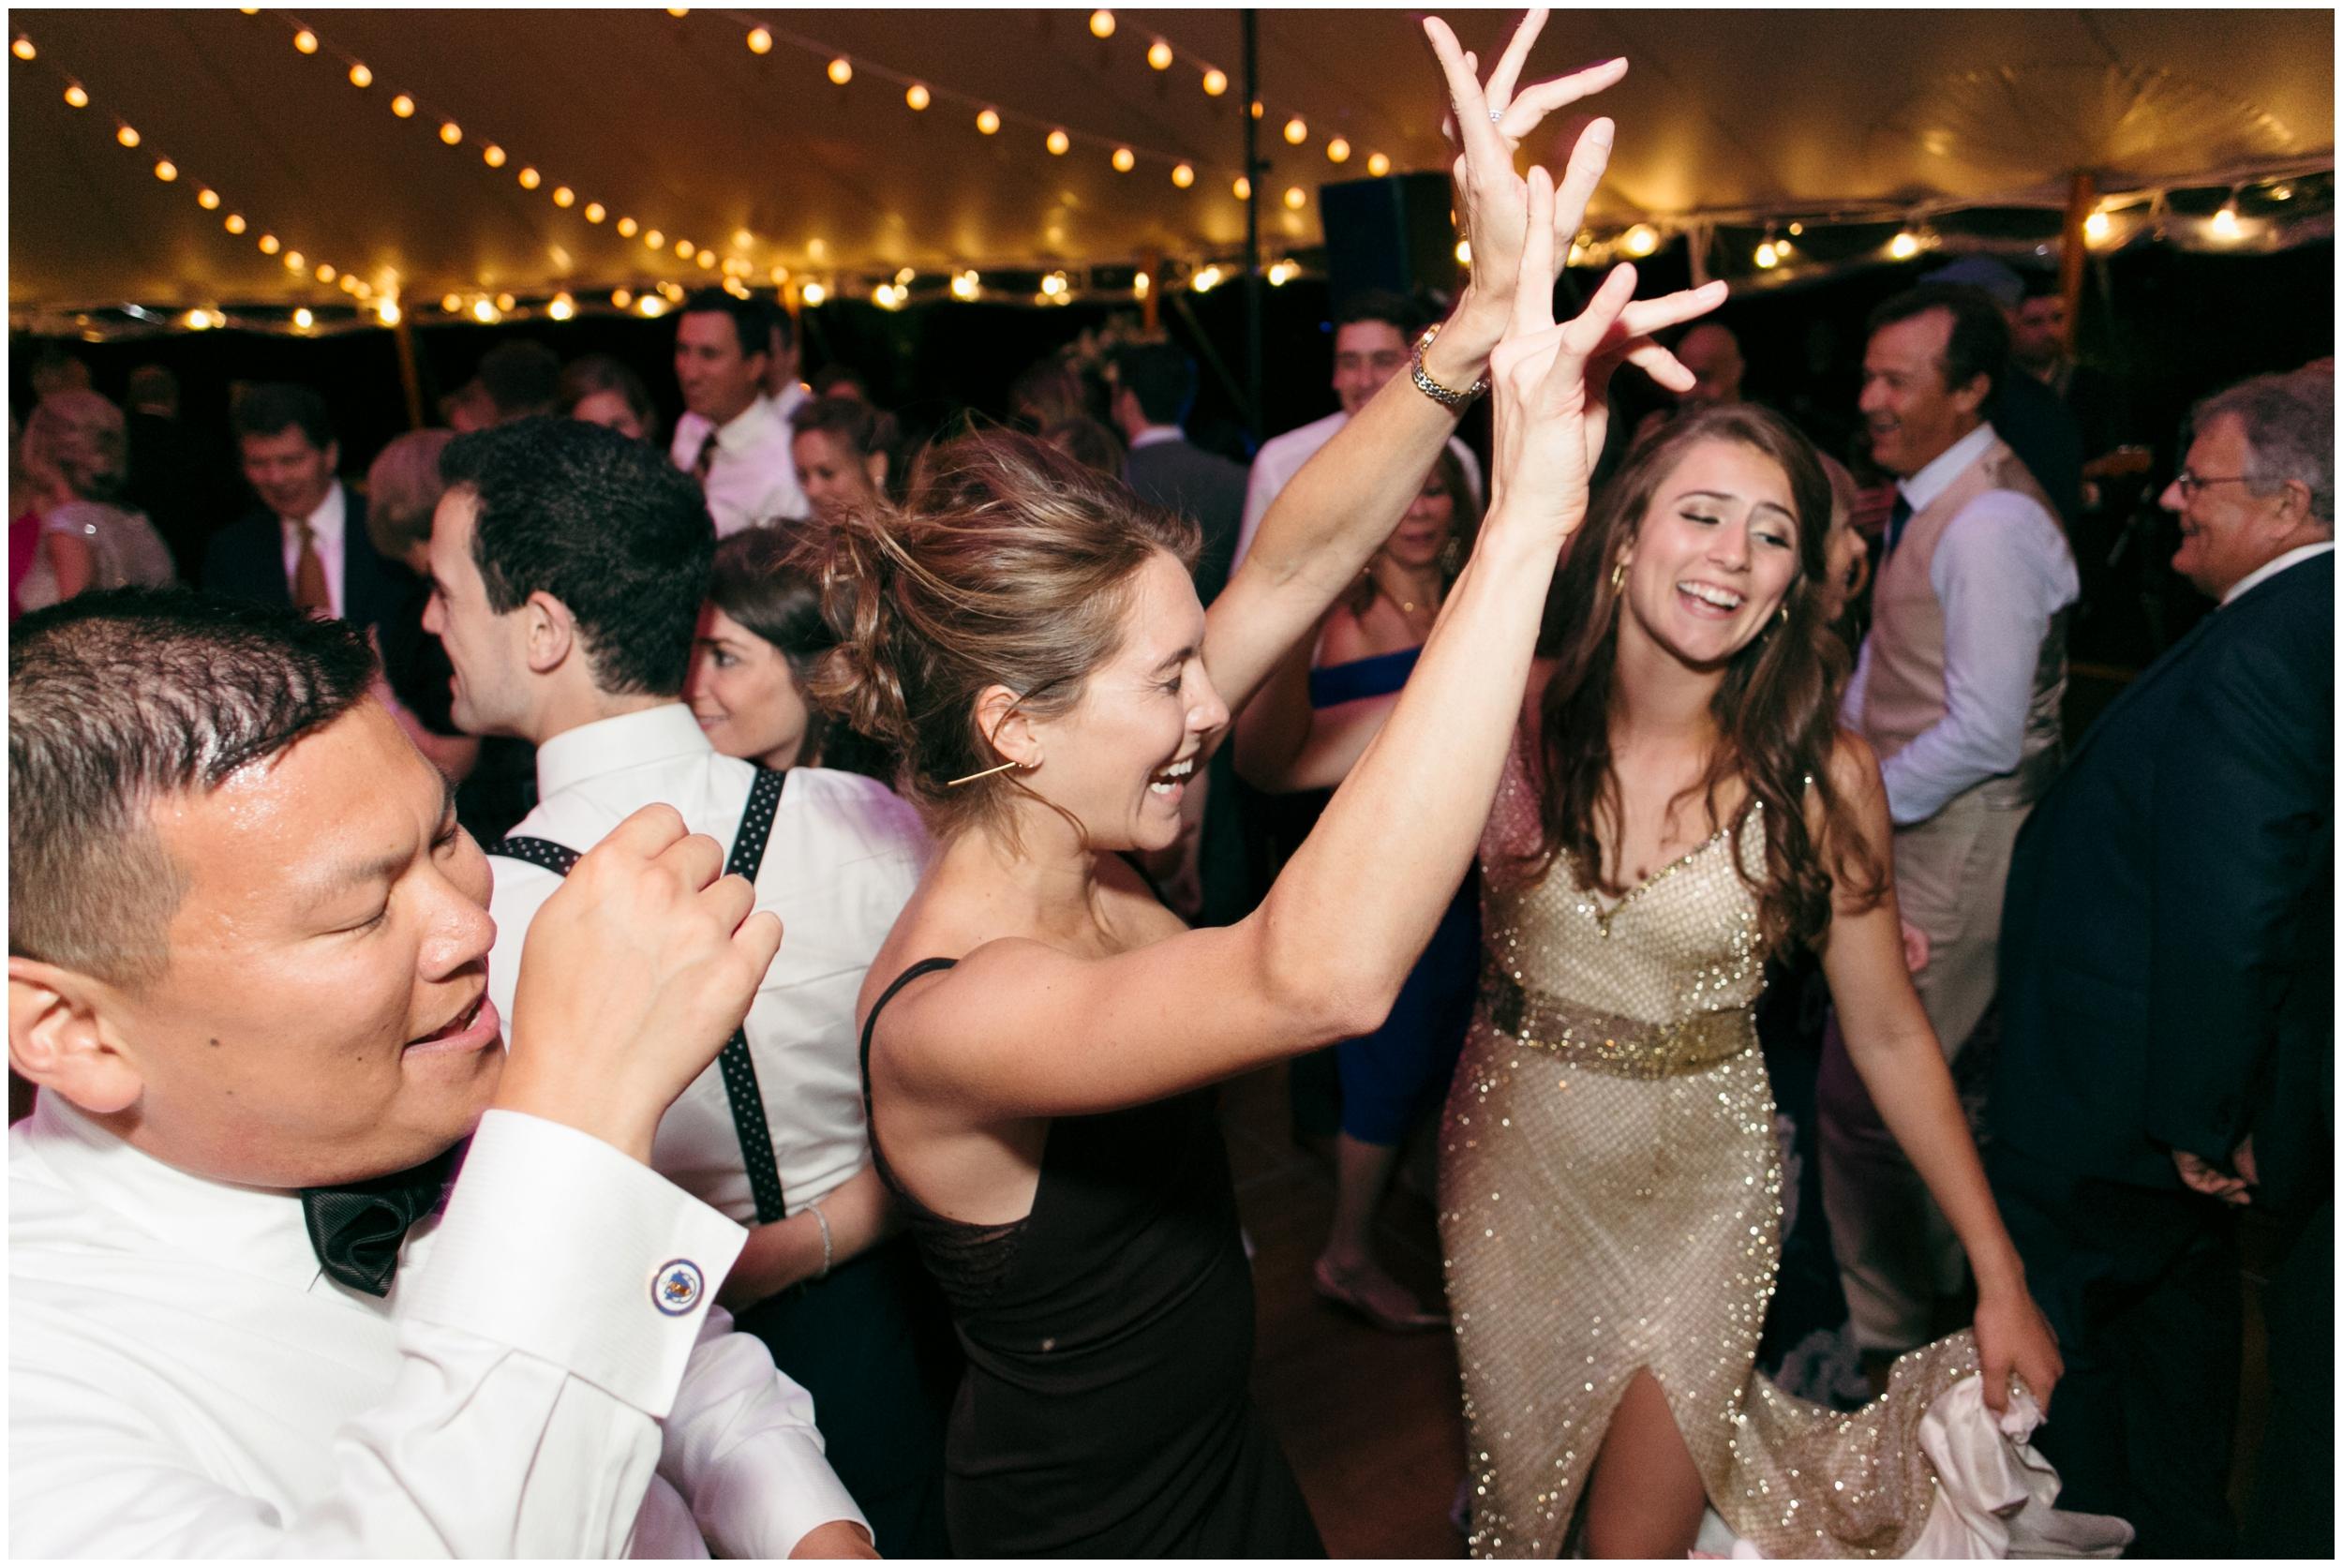 Willowdale-Estate-Wedding-Bailey-Q-Photo-Boston-Wedding-Photographer-102.JPG